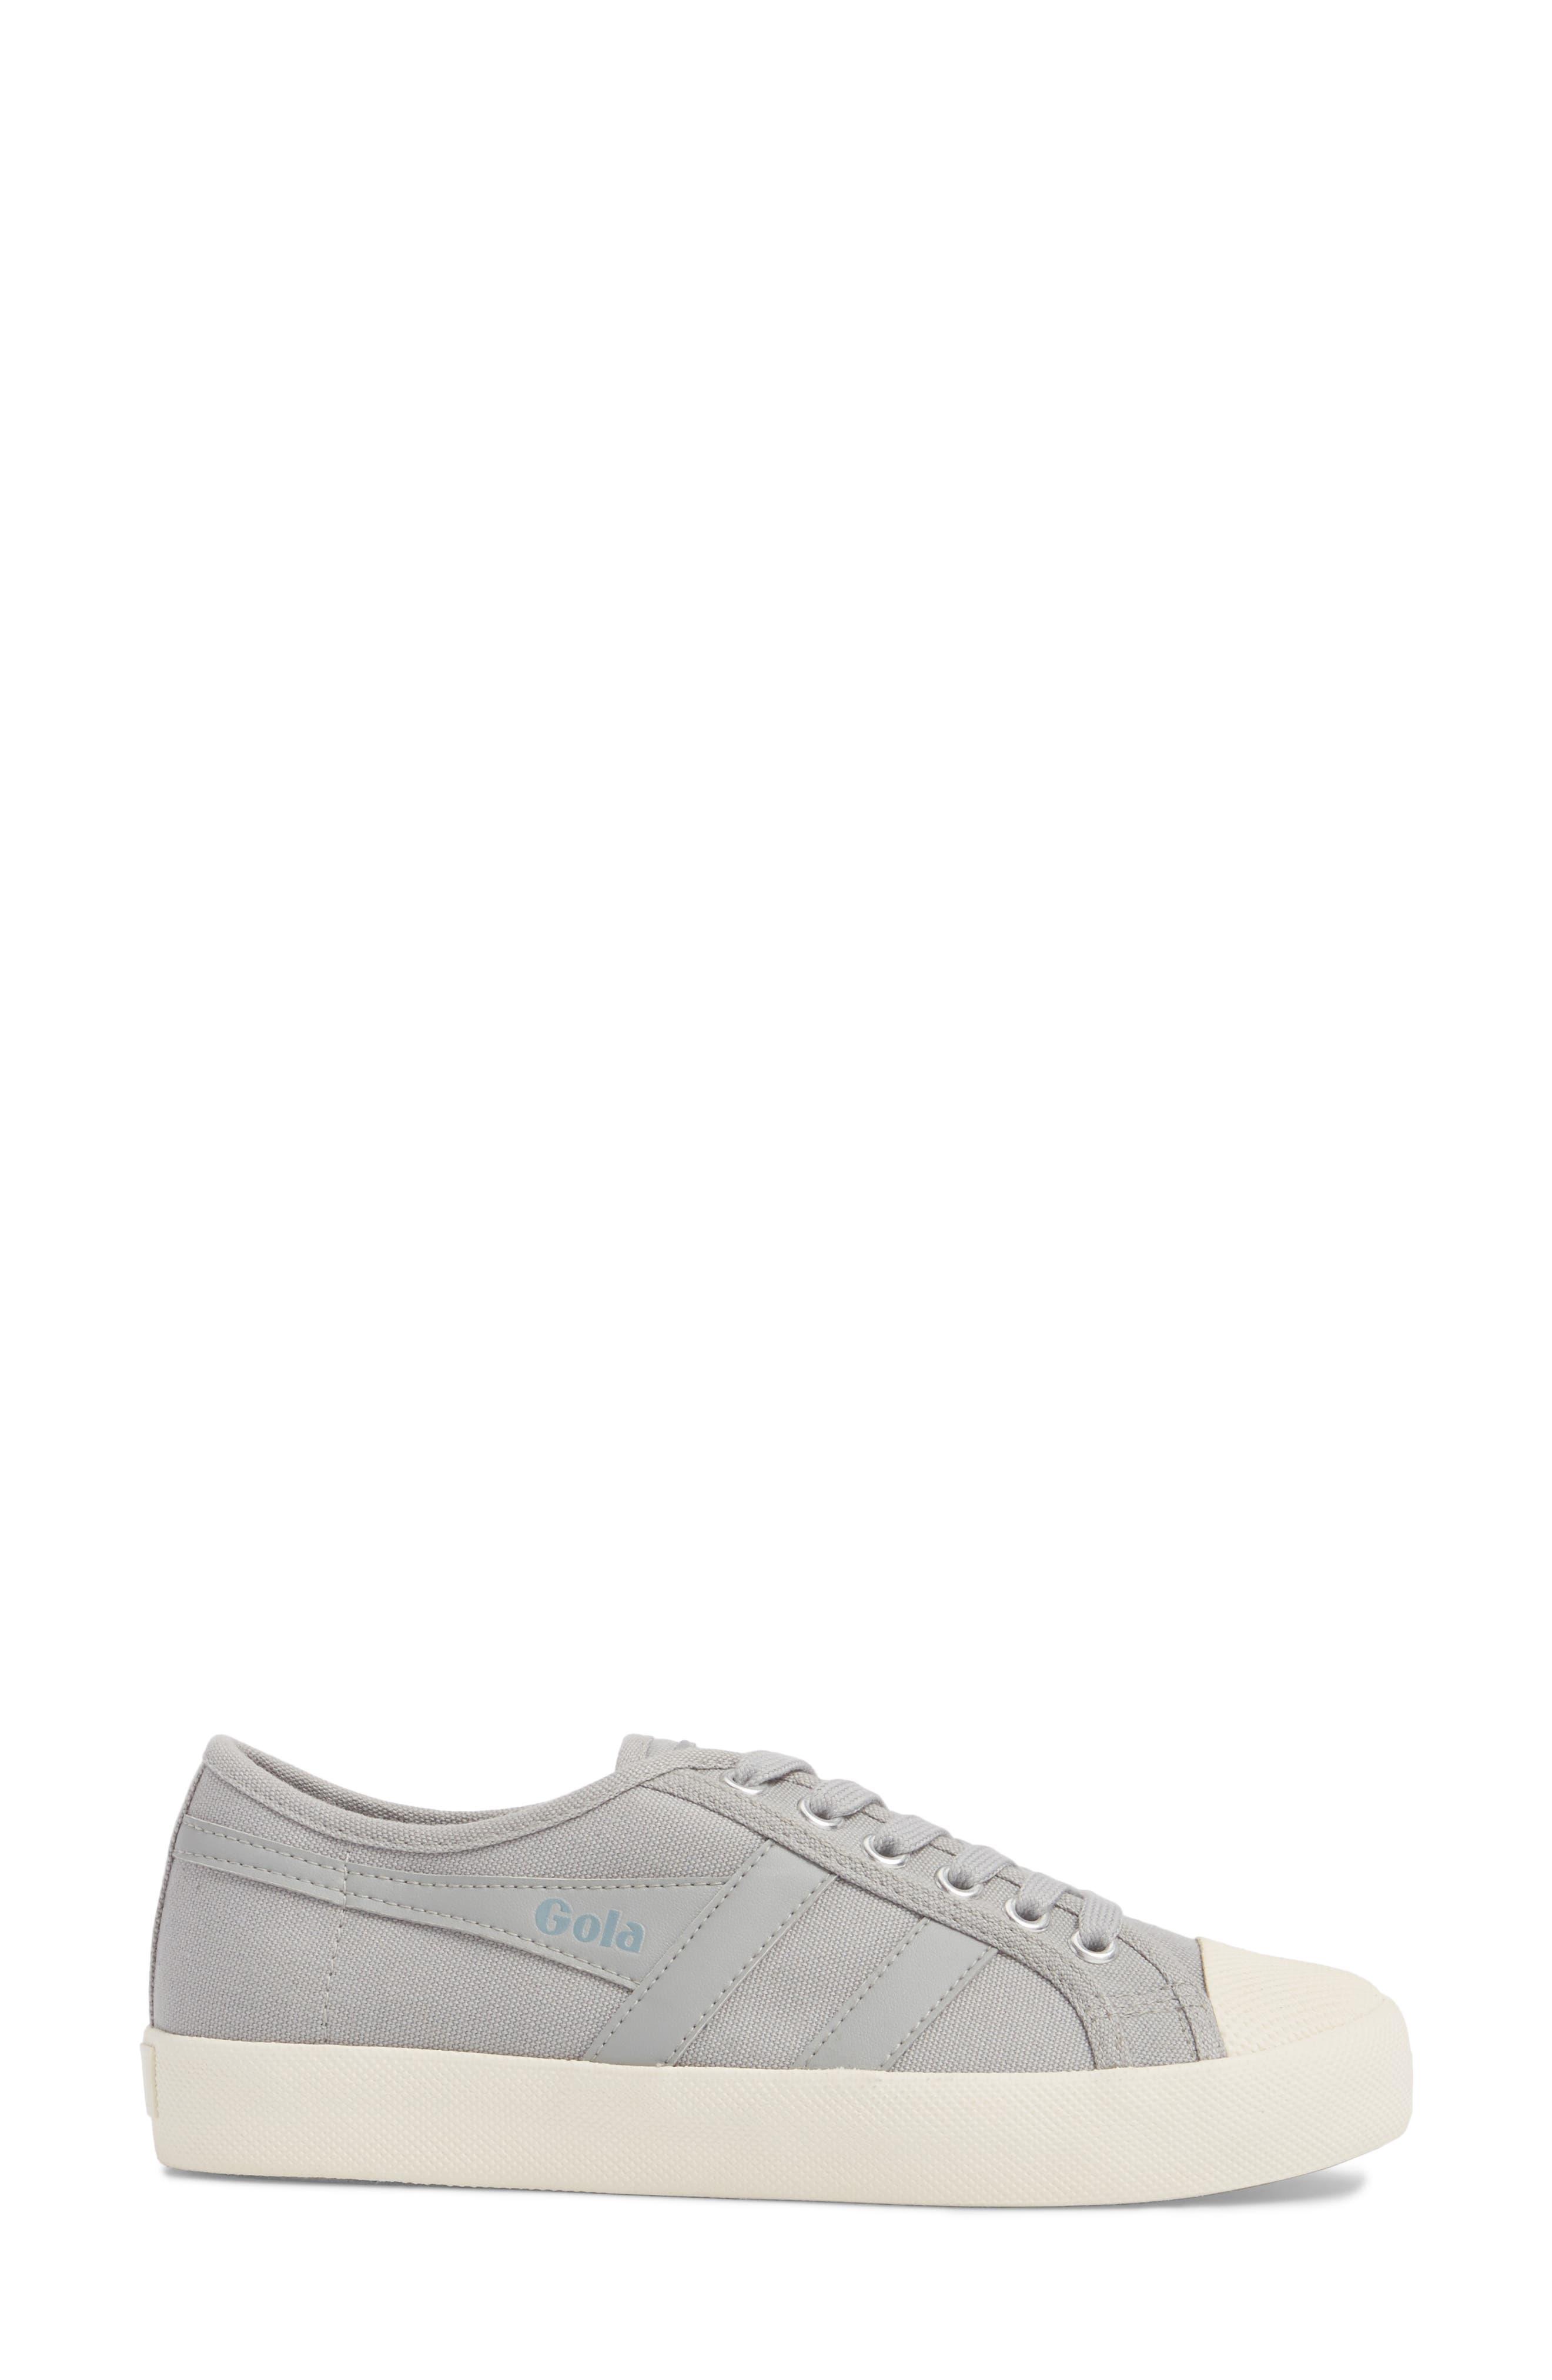 Coaster Sneaker,                             Alternate thumbnail 3, color,                             Paloma/ Off White